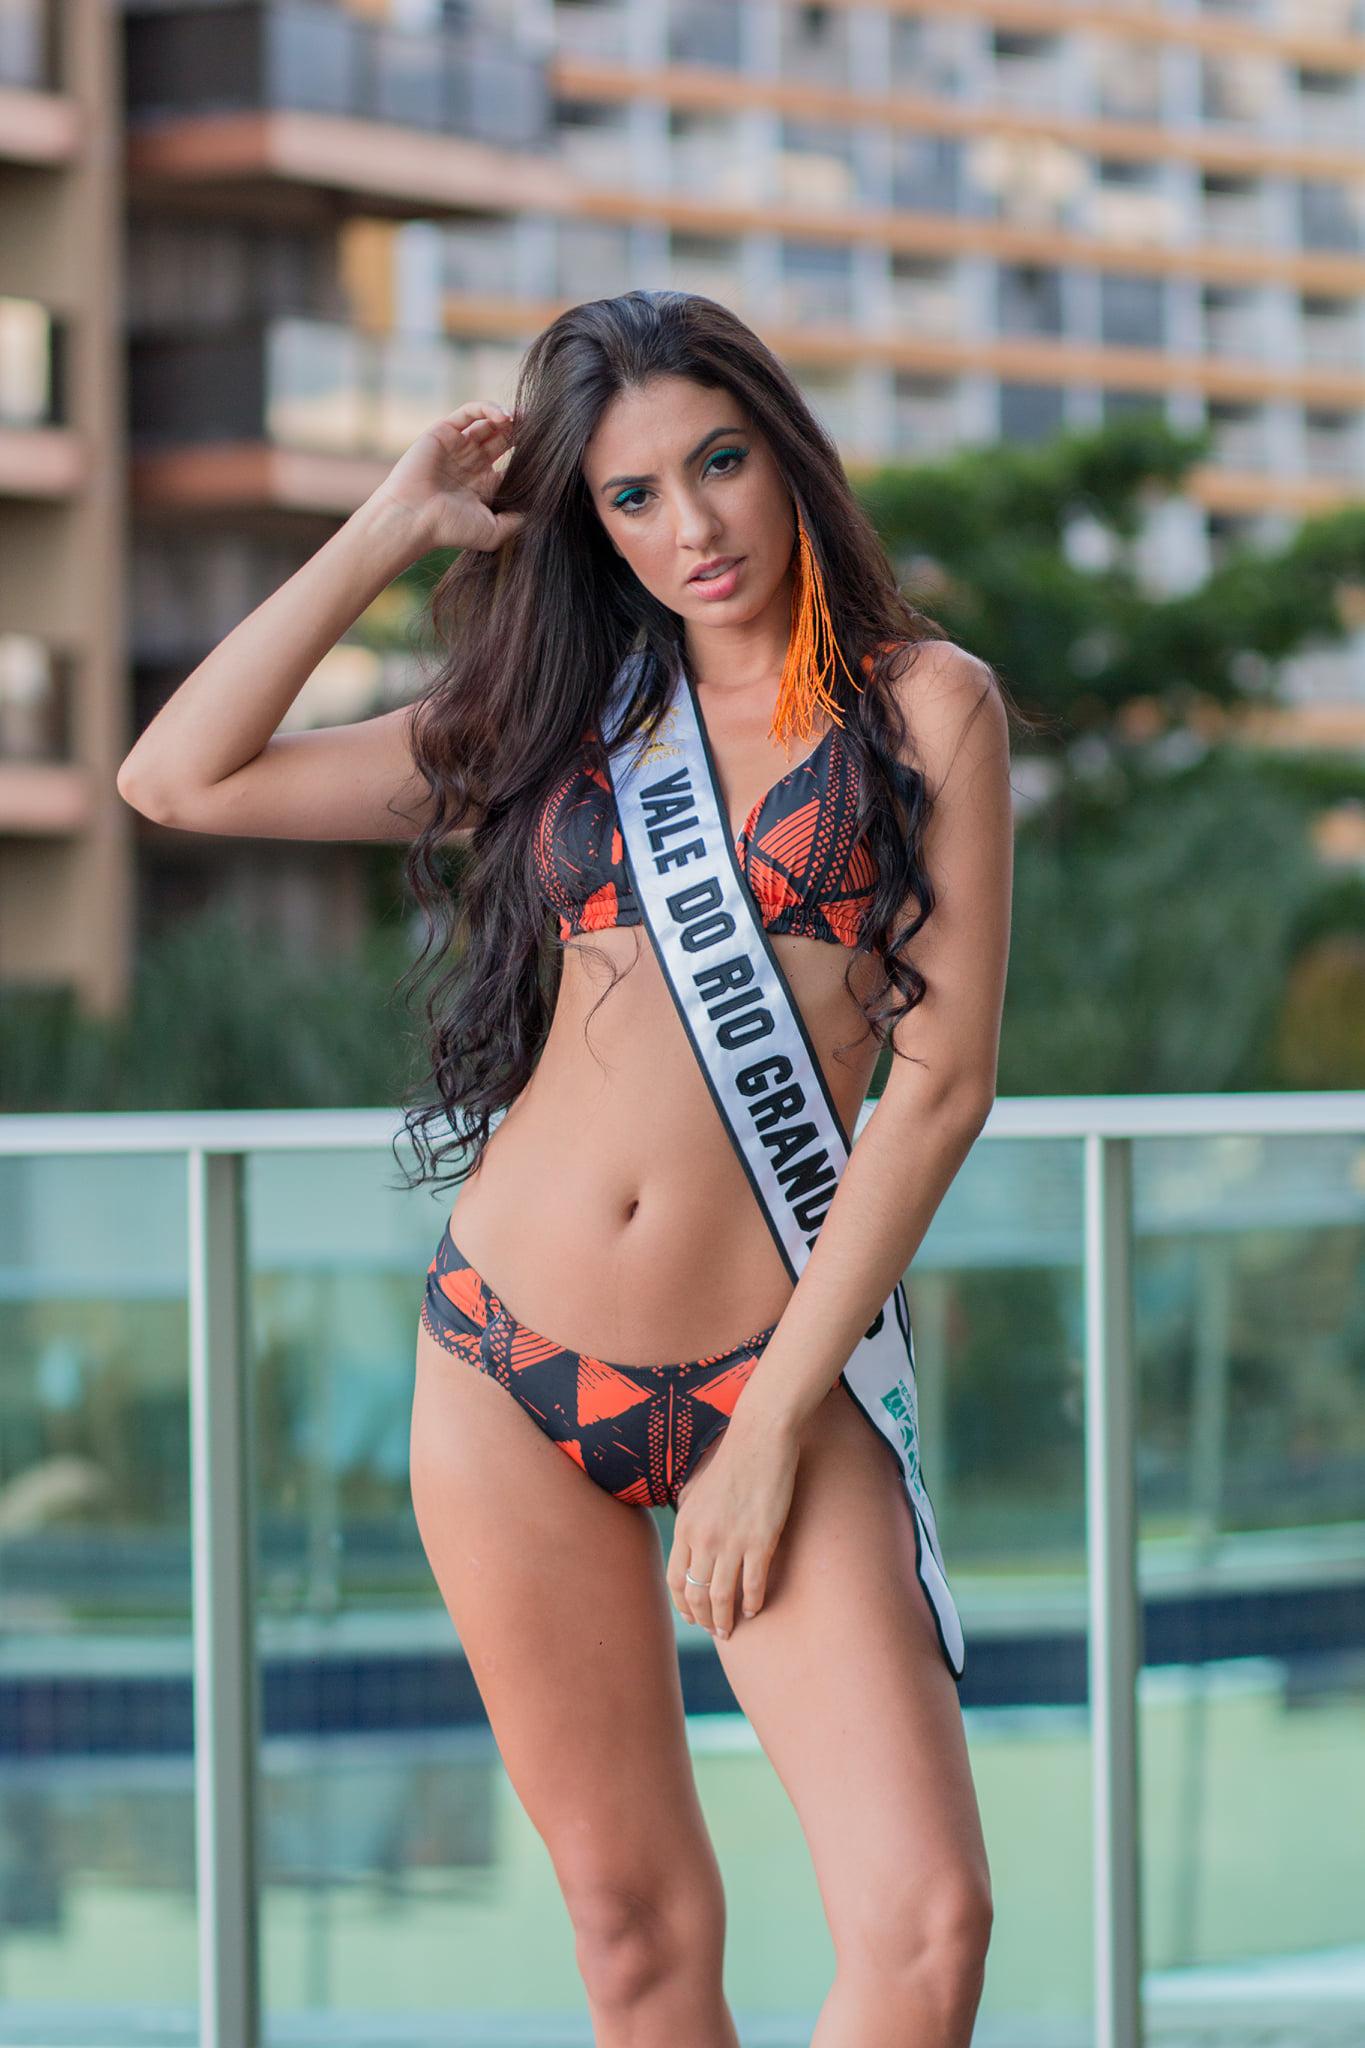 cristielli camargo, miss brasil mesoamerica 2021/top 13 de miss supranational brazil 2020/top 21 de miss brasil mundo 2018. - Página 5 12818911